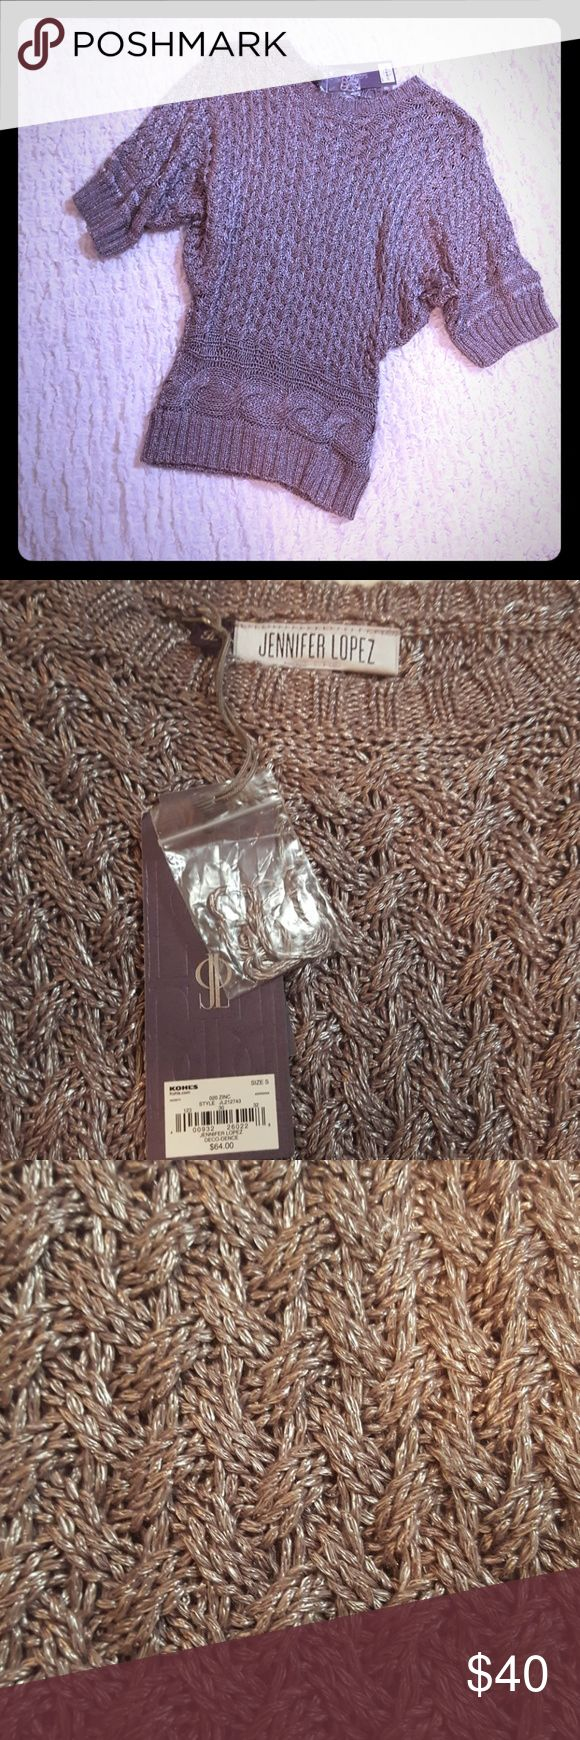 🦉JENNIFER LOPEZ MAUVE SWEATER🦉 Mauve Sweater TAGS STILL ATTACHED  EXCELLENT CONDITION  NEW NEVER WORN Jennifer Lopez Sweaters